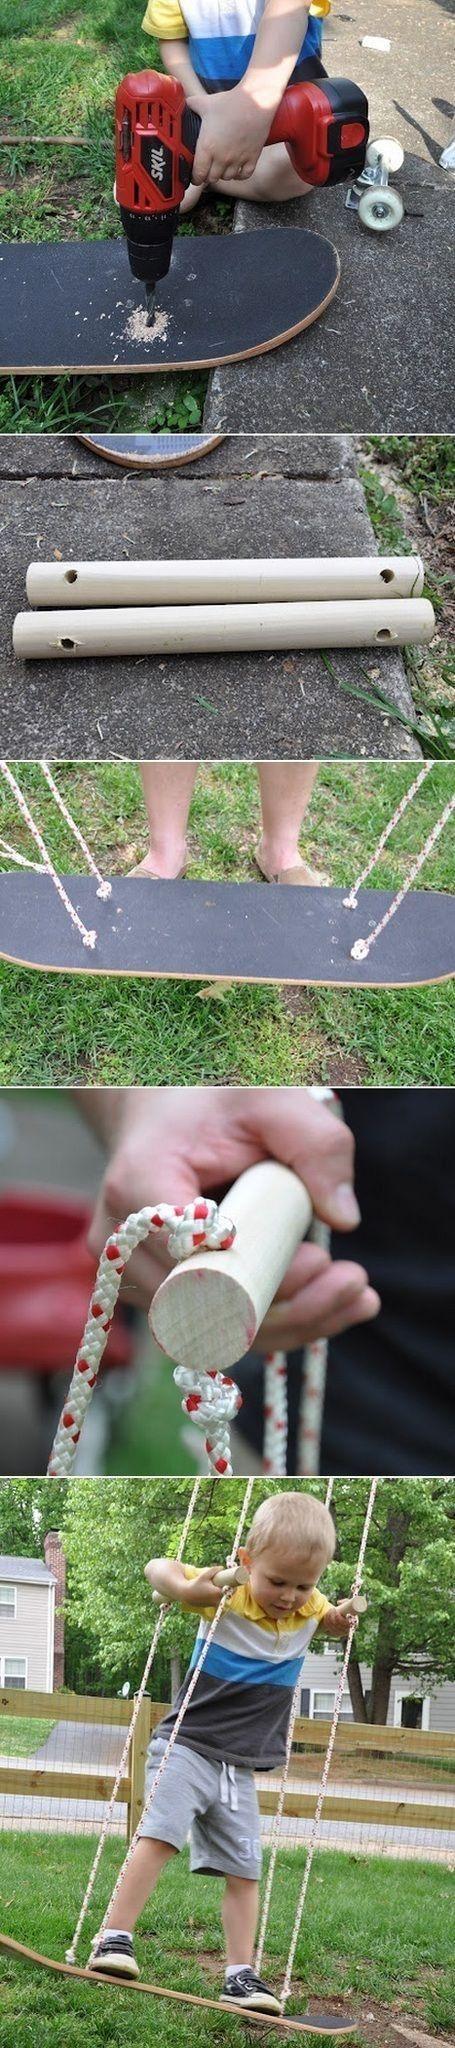 How to make a Skateboard Swing http://www.joybx.com/entry/21672.html